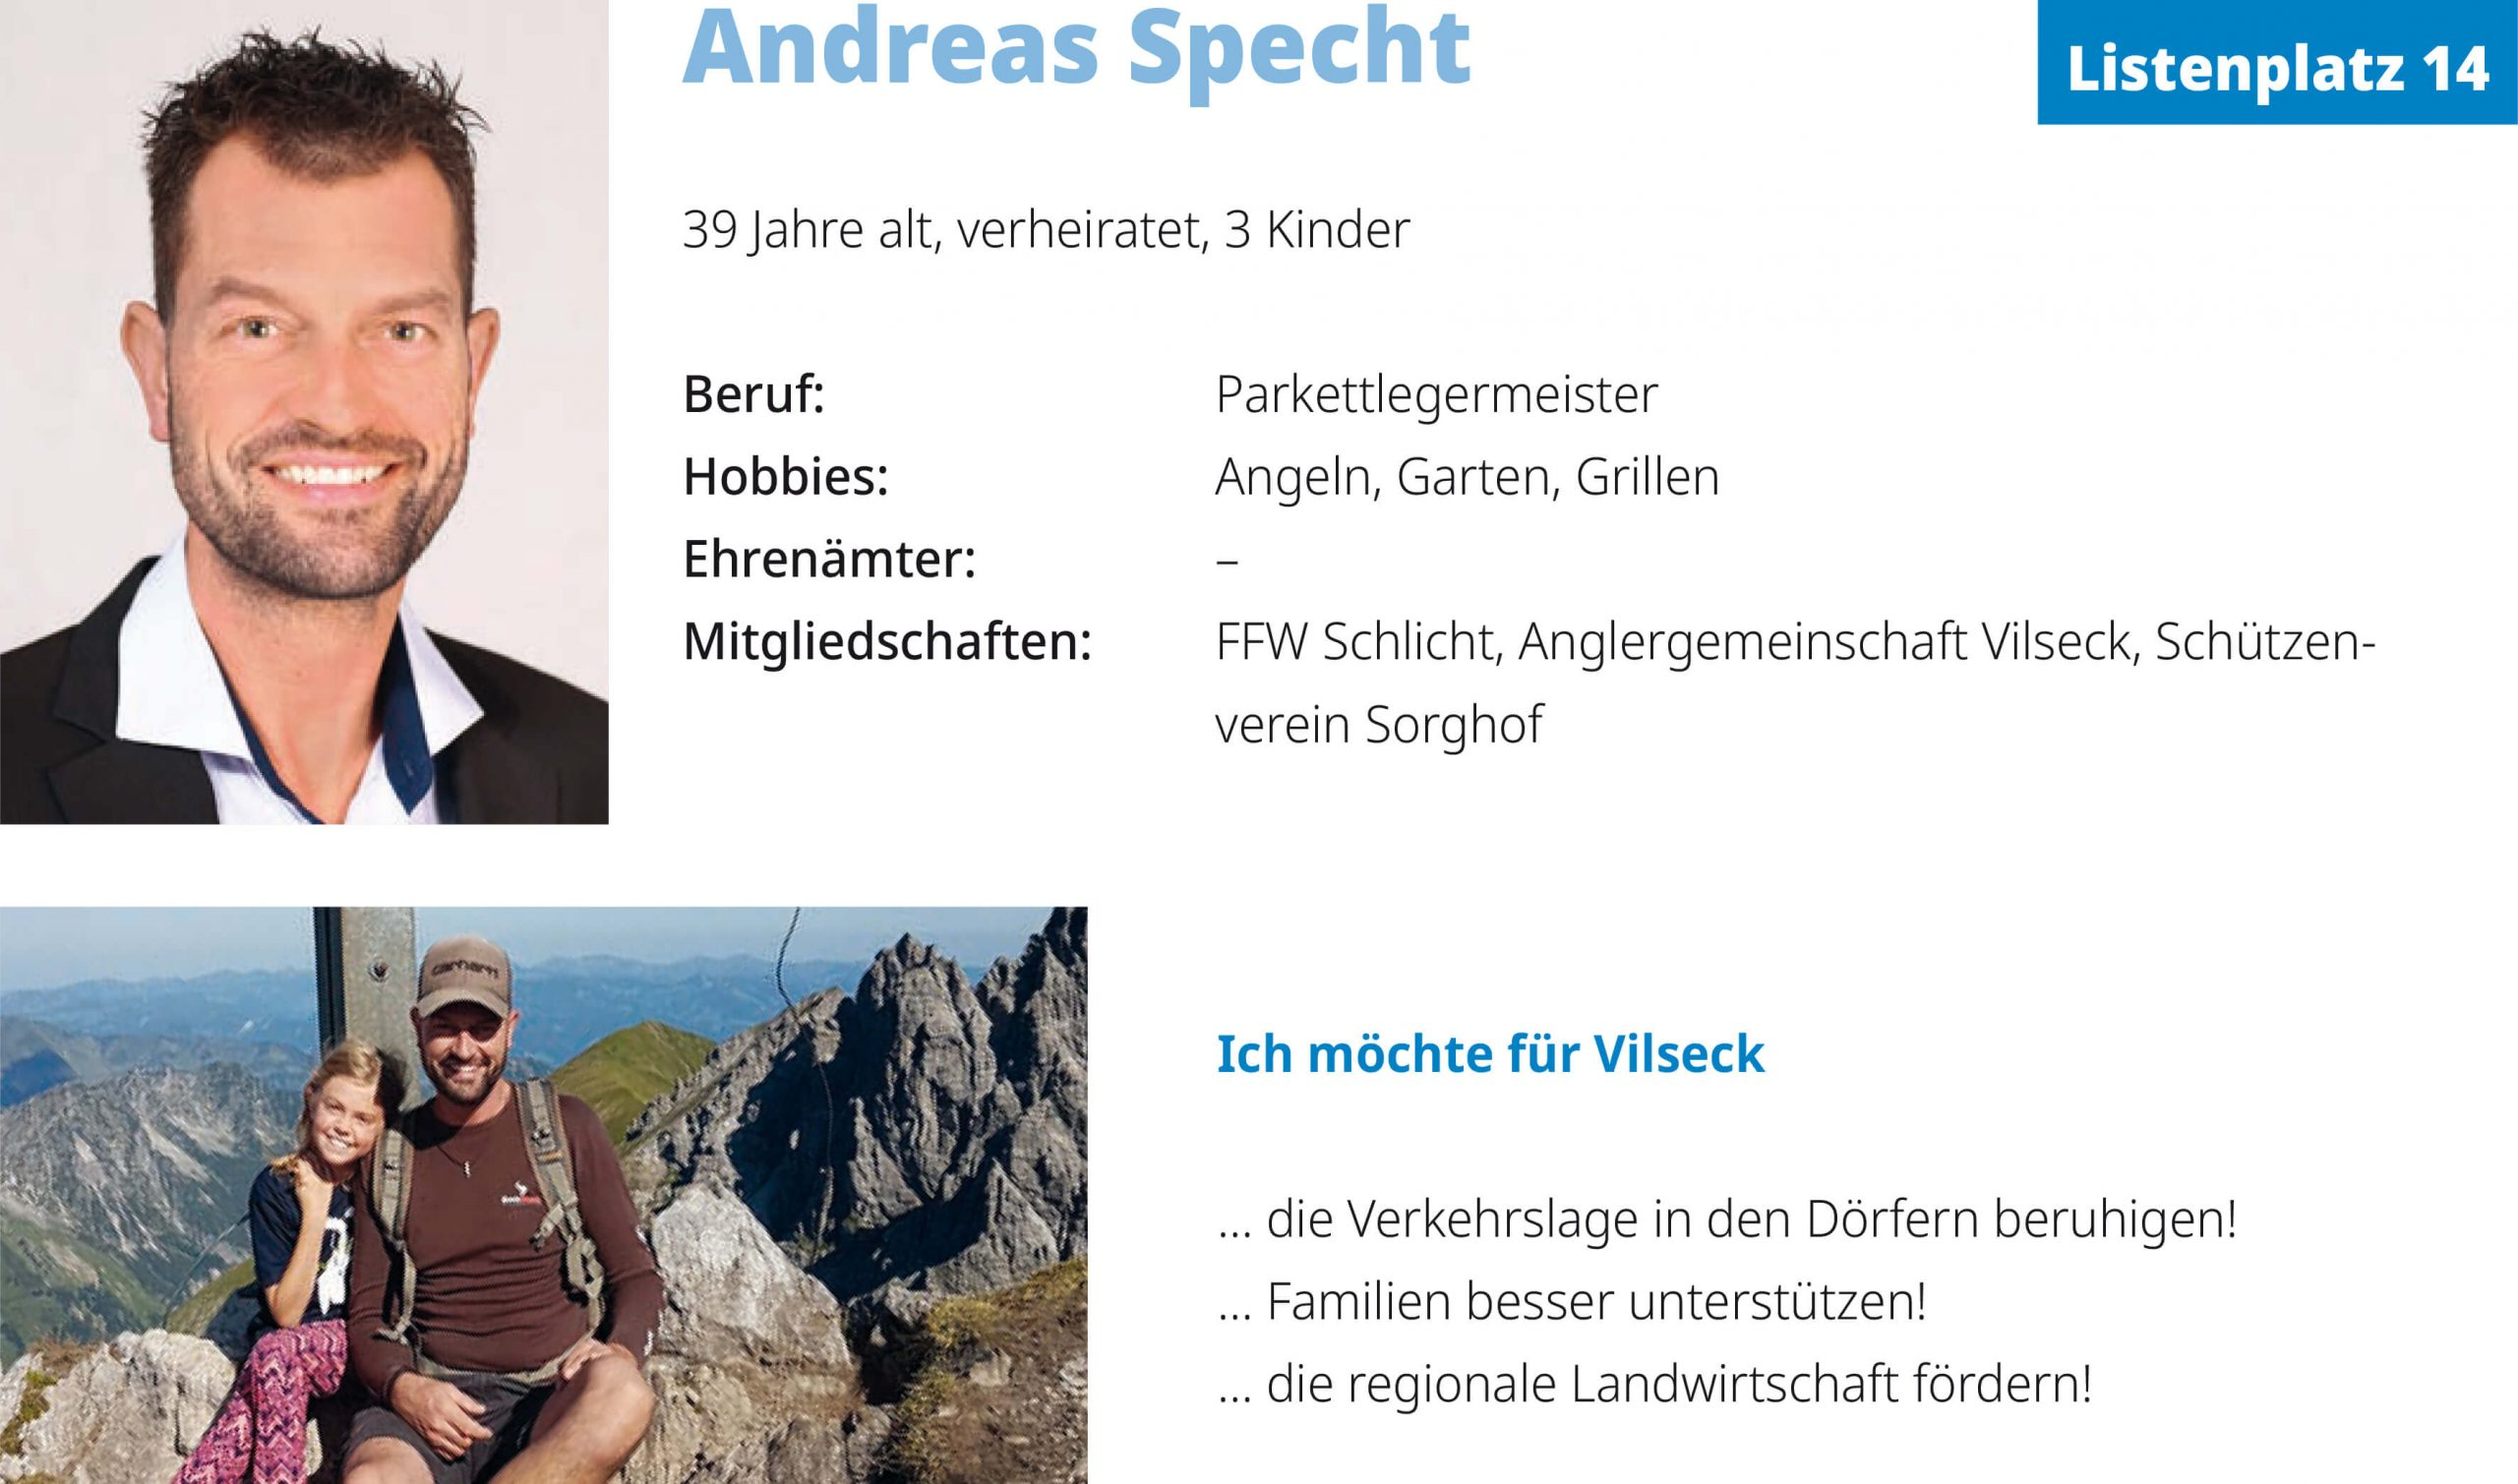 Andreas Specht